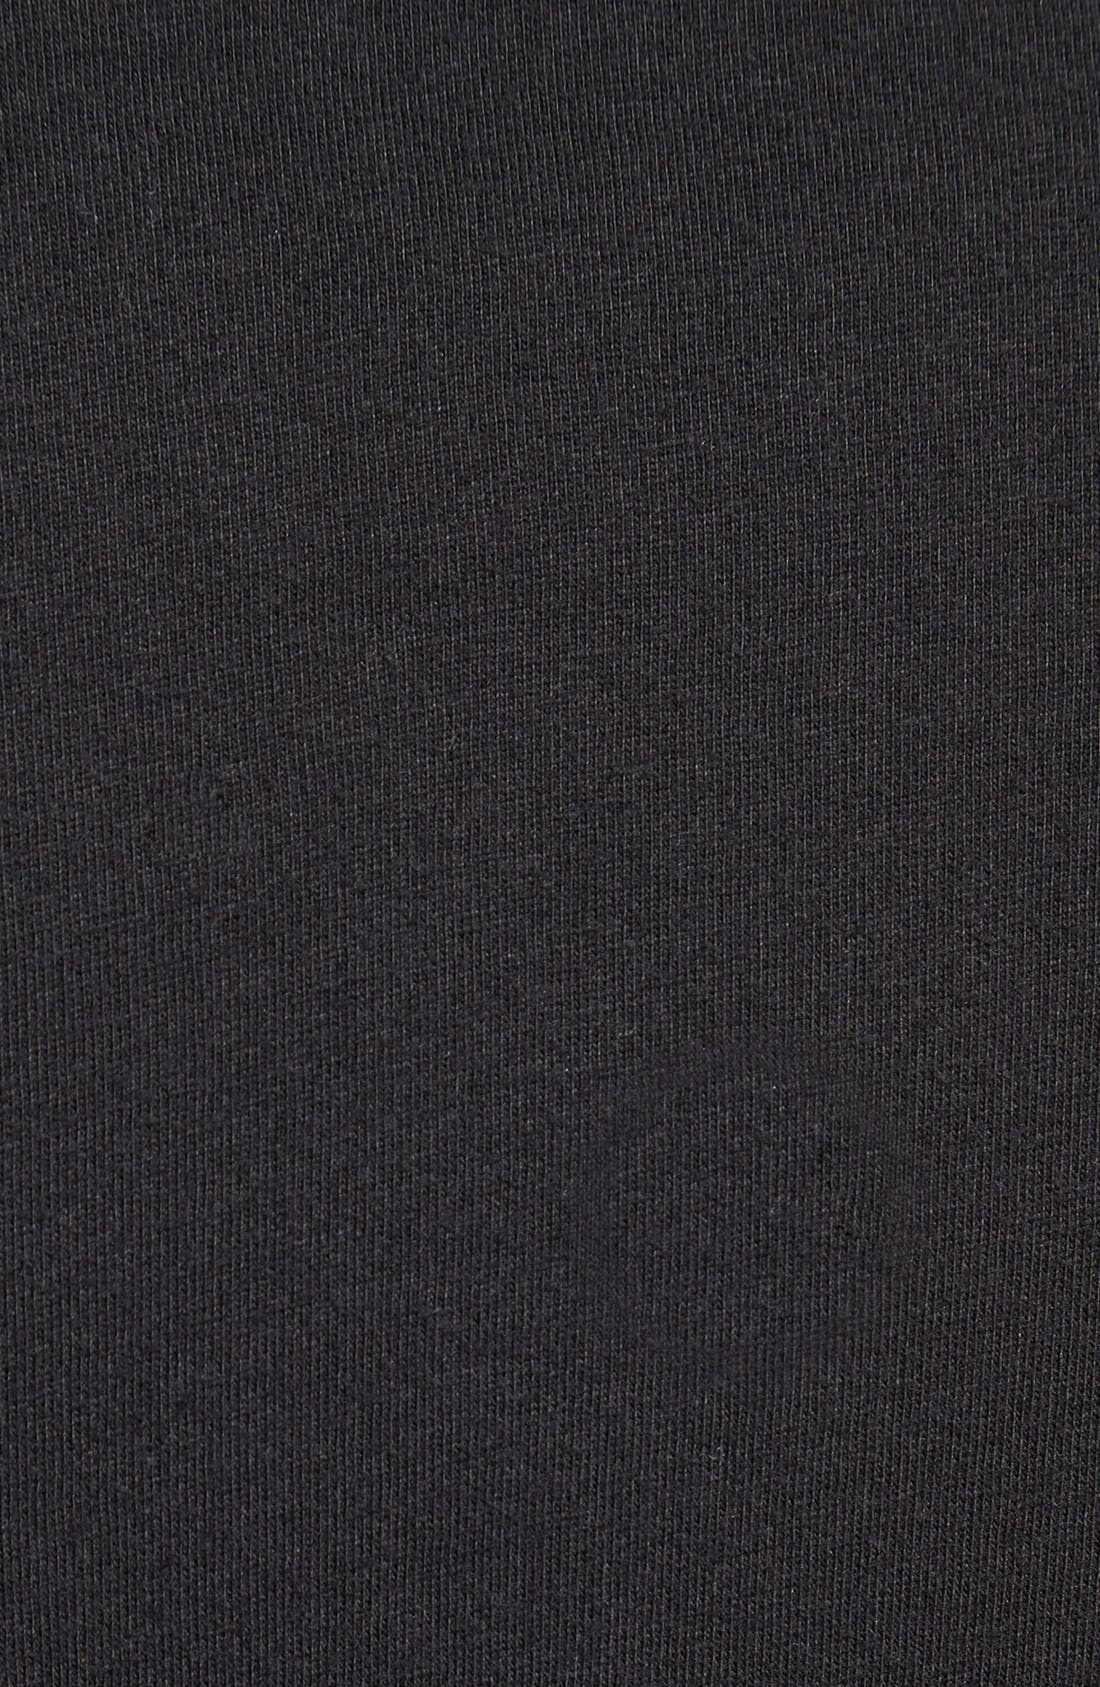 Alternate Image 3  - Kid Dangerous 'Sunday Funday Football' Slim Fit T-Shirt (Online Only)